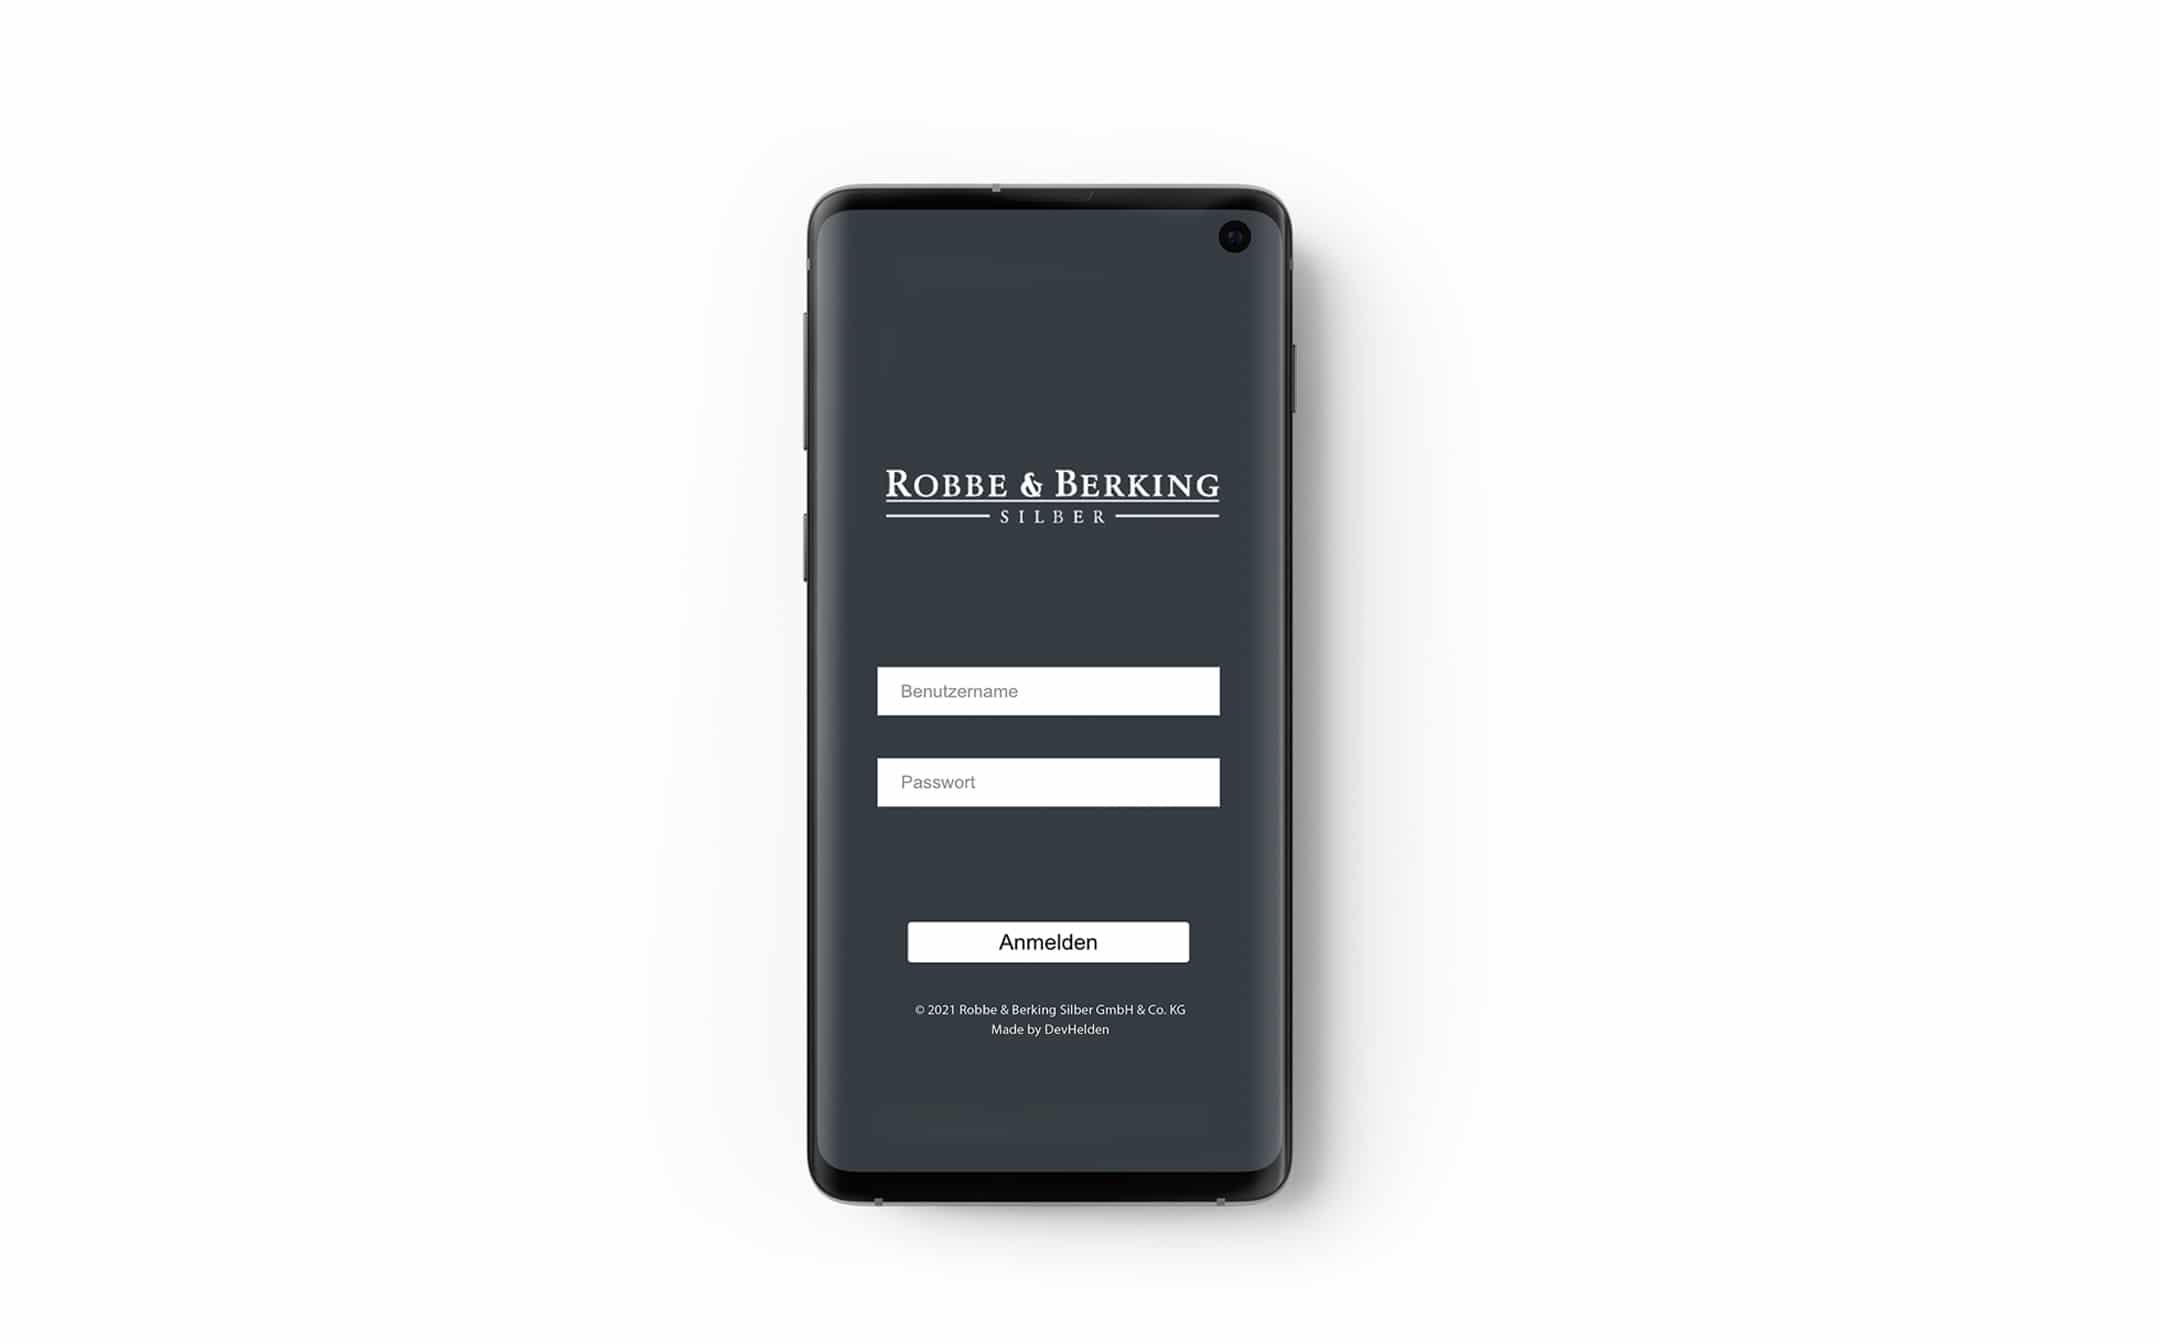 robbe-berking-smartphone-app